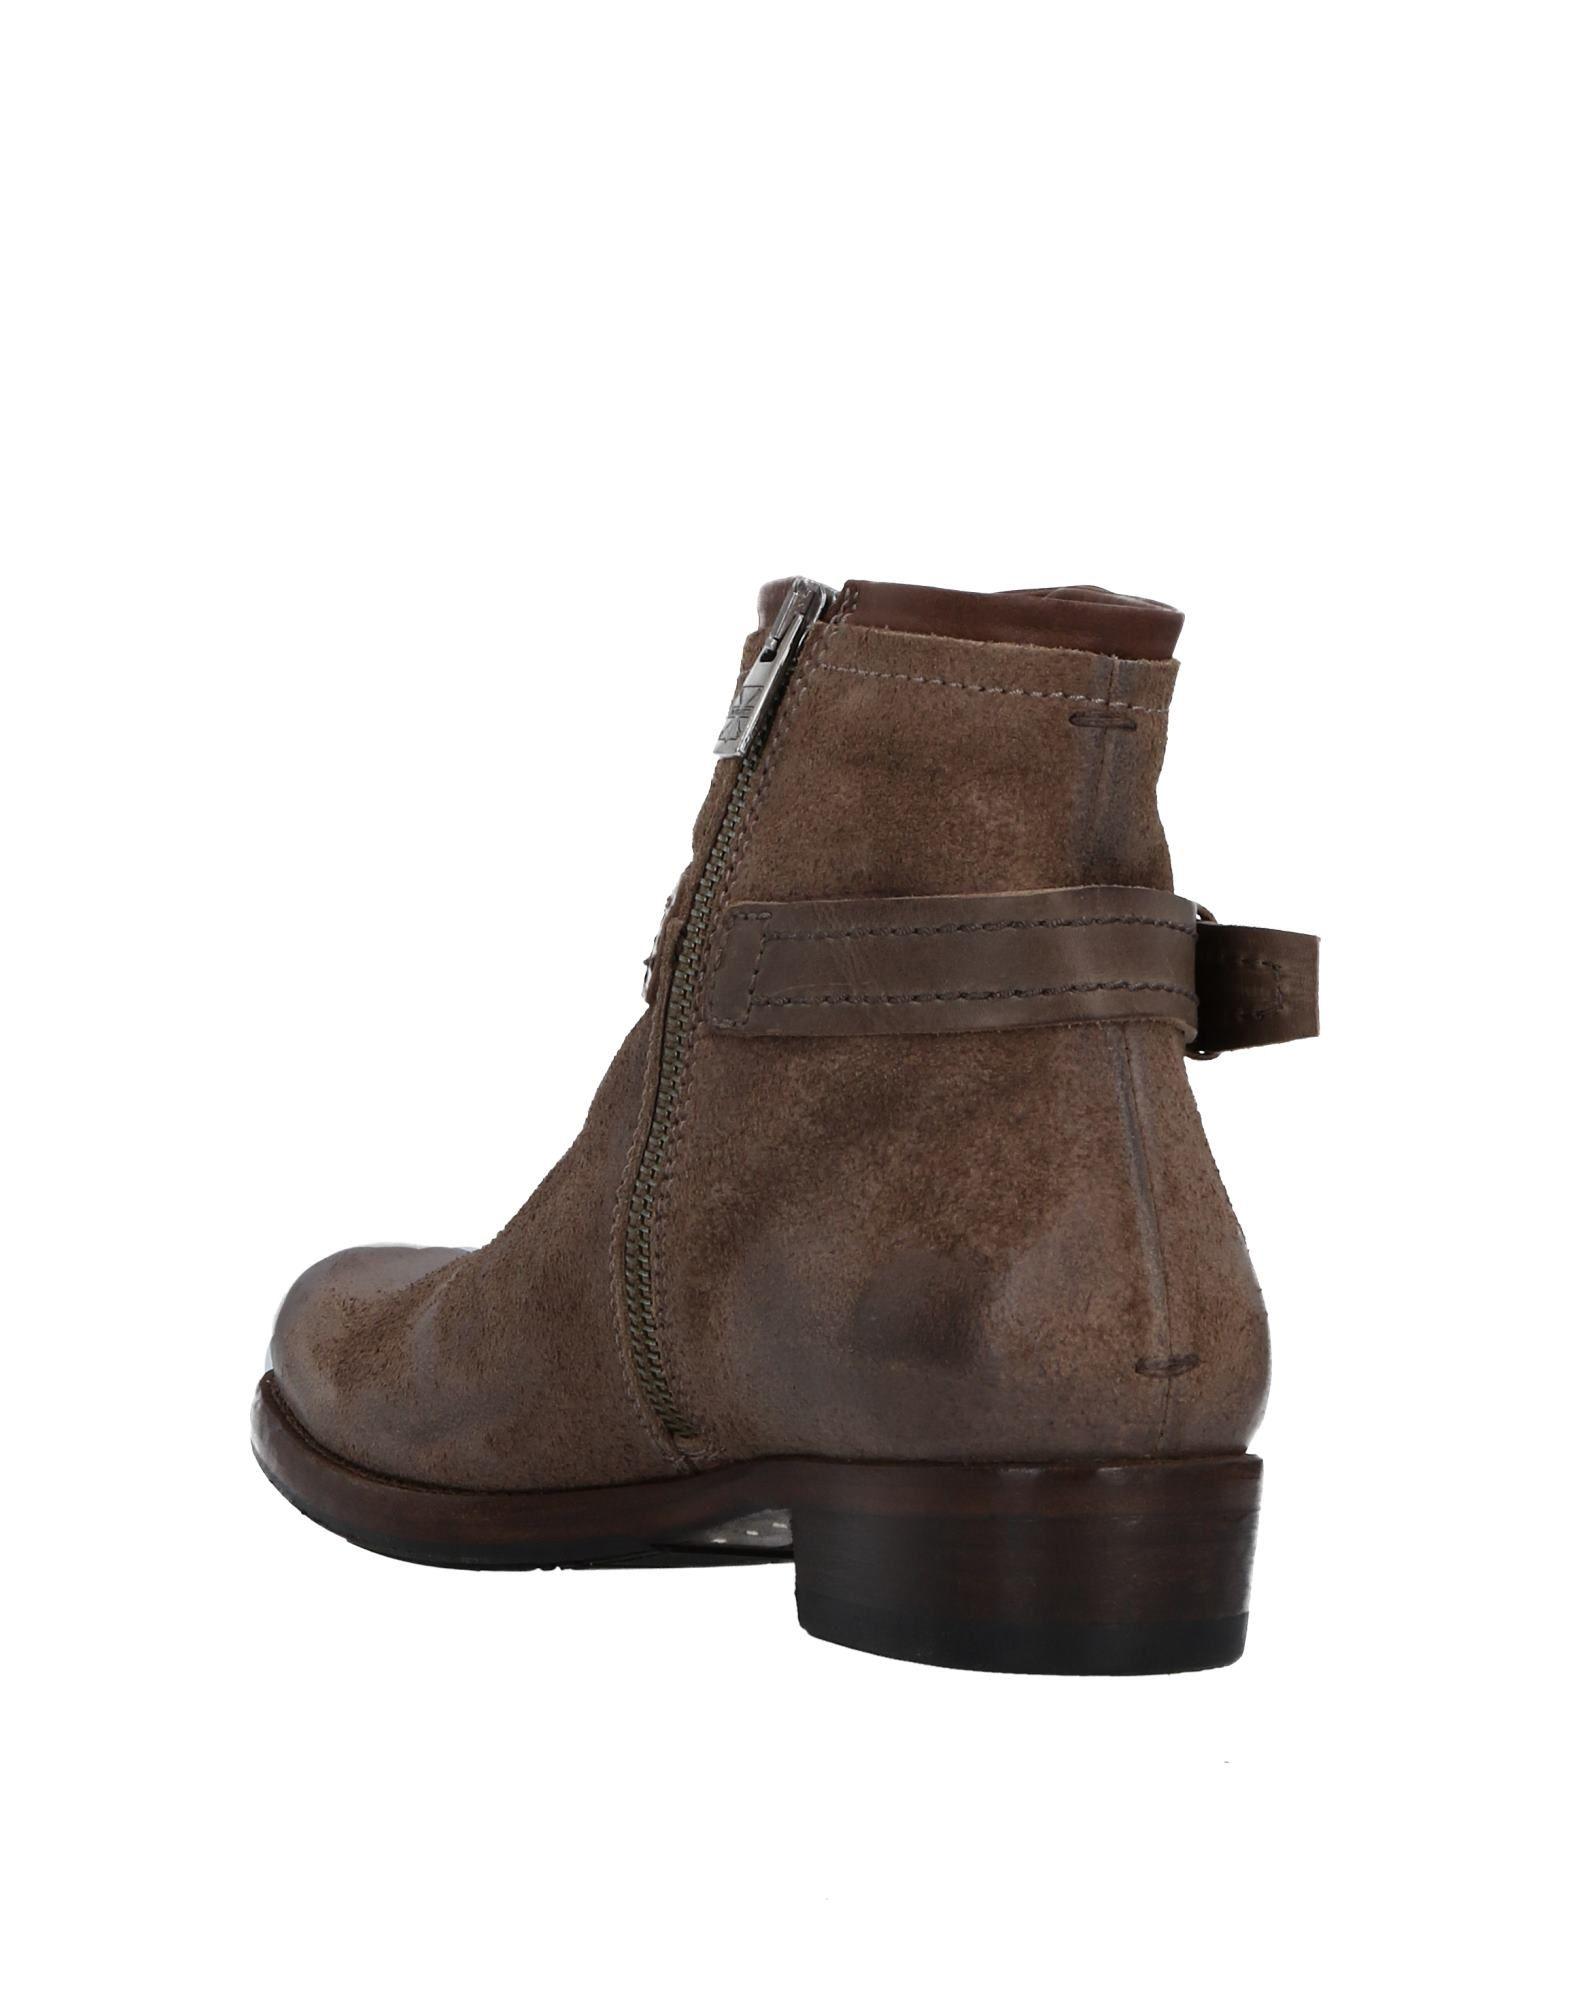 Pantanetti Stiefelette Damen  11512343ELGut aussehende strapazierfähige Schuhe